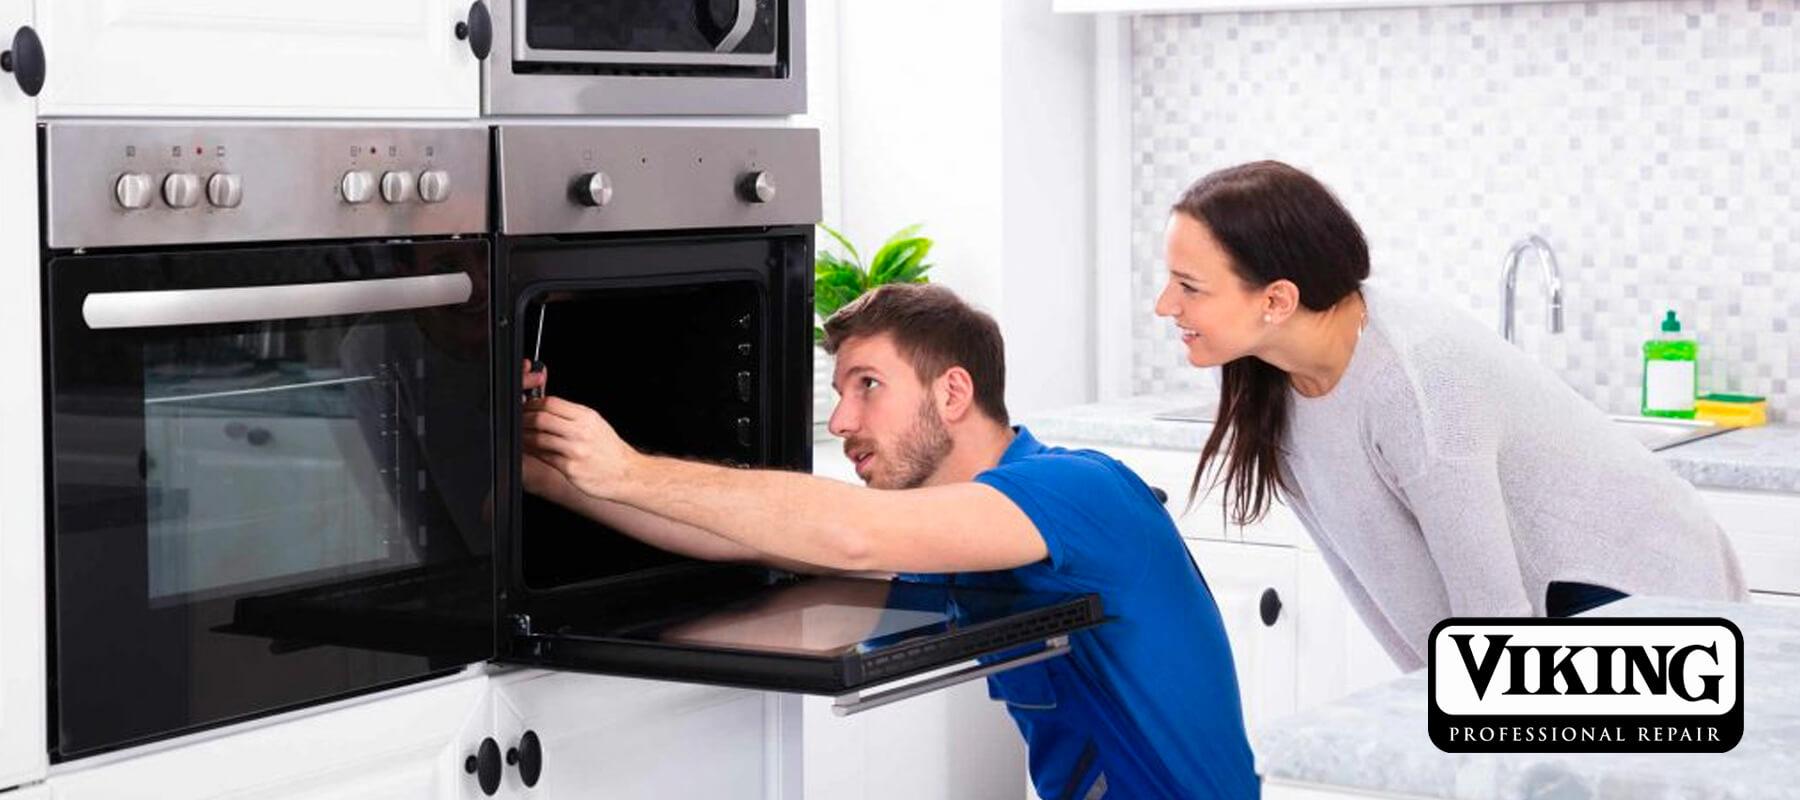 Authorized Viking Appliance Repair Service Woodland Hills | Professional Viking Repair